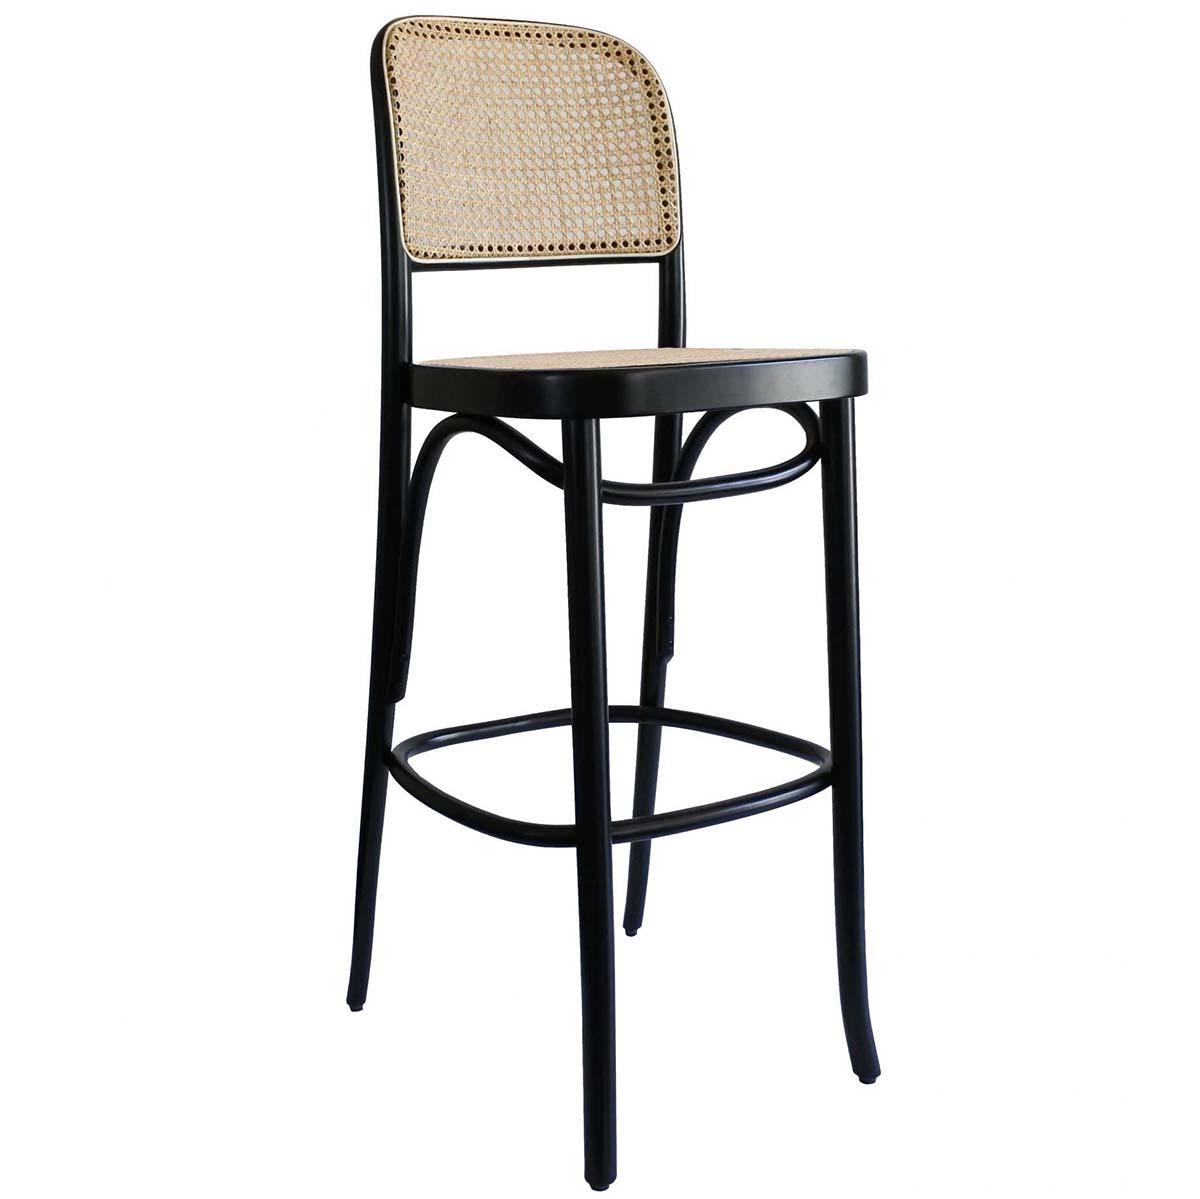 Gebrüder Thonet Vienna Барный стул «N 811 Hocker»